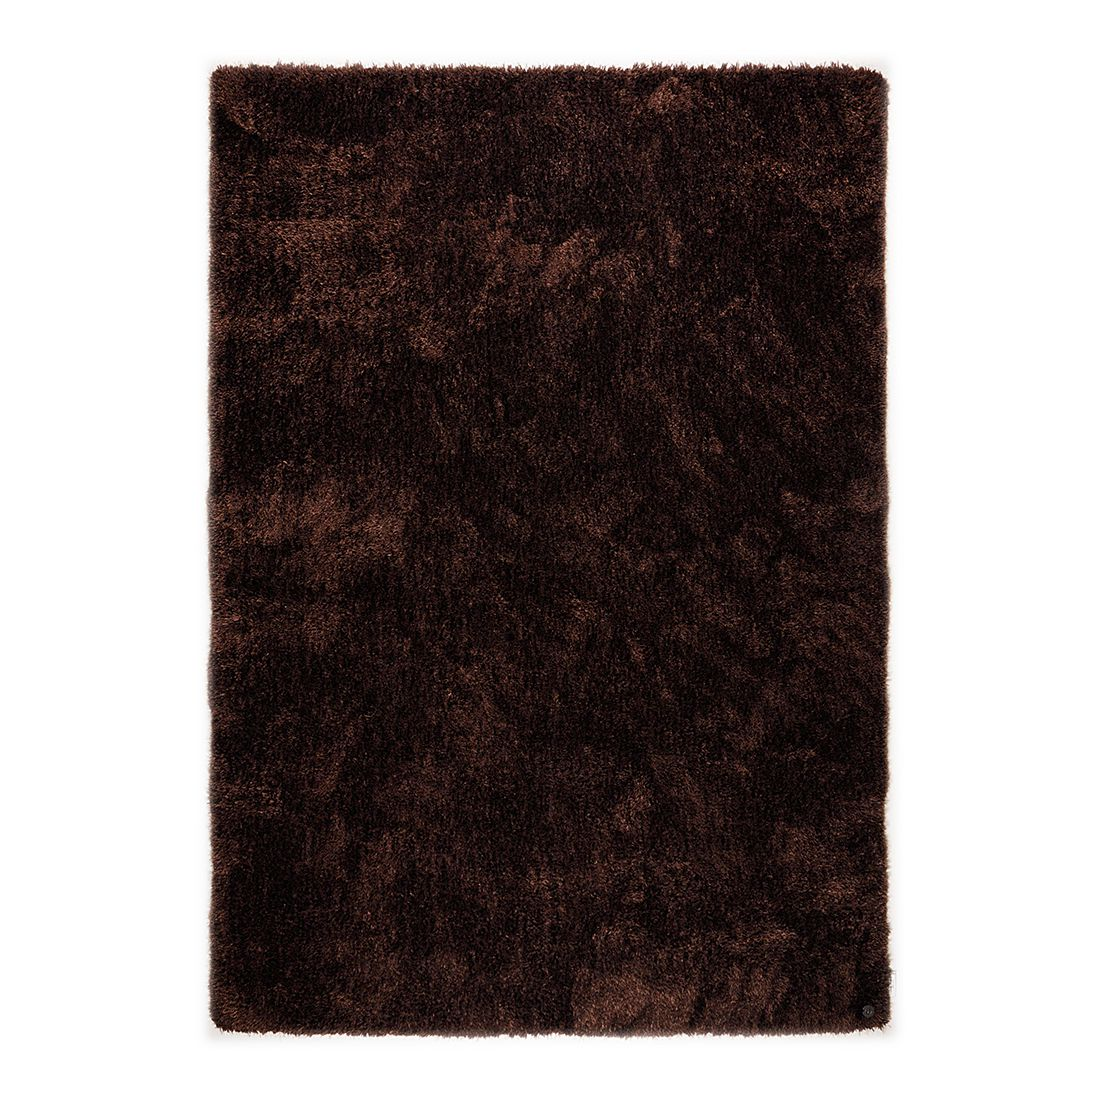 Tapijt Soft Square - chocoladekleurig - maat: 65x135cm, Tom Tailor